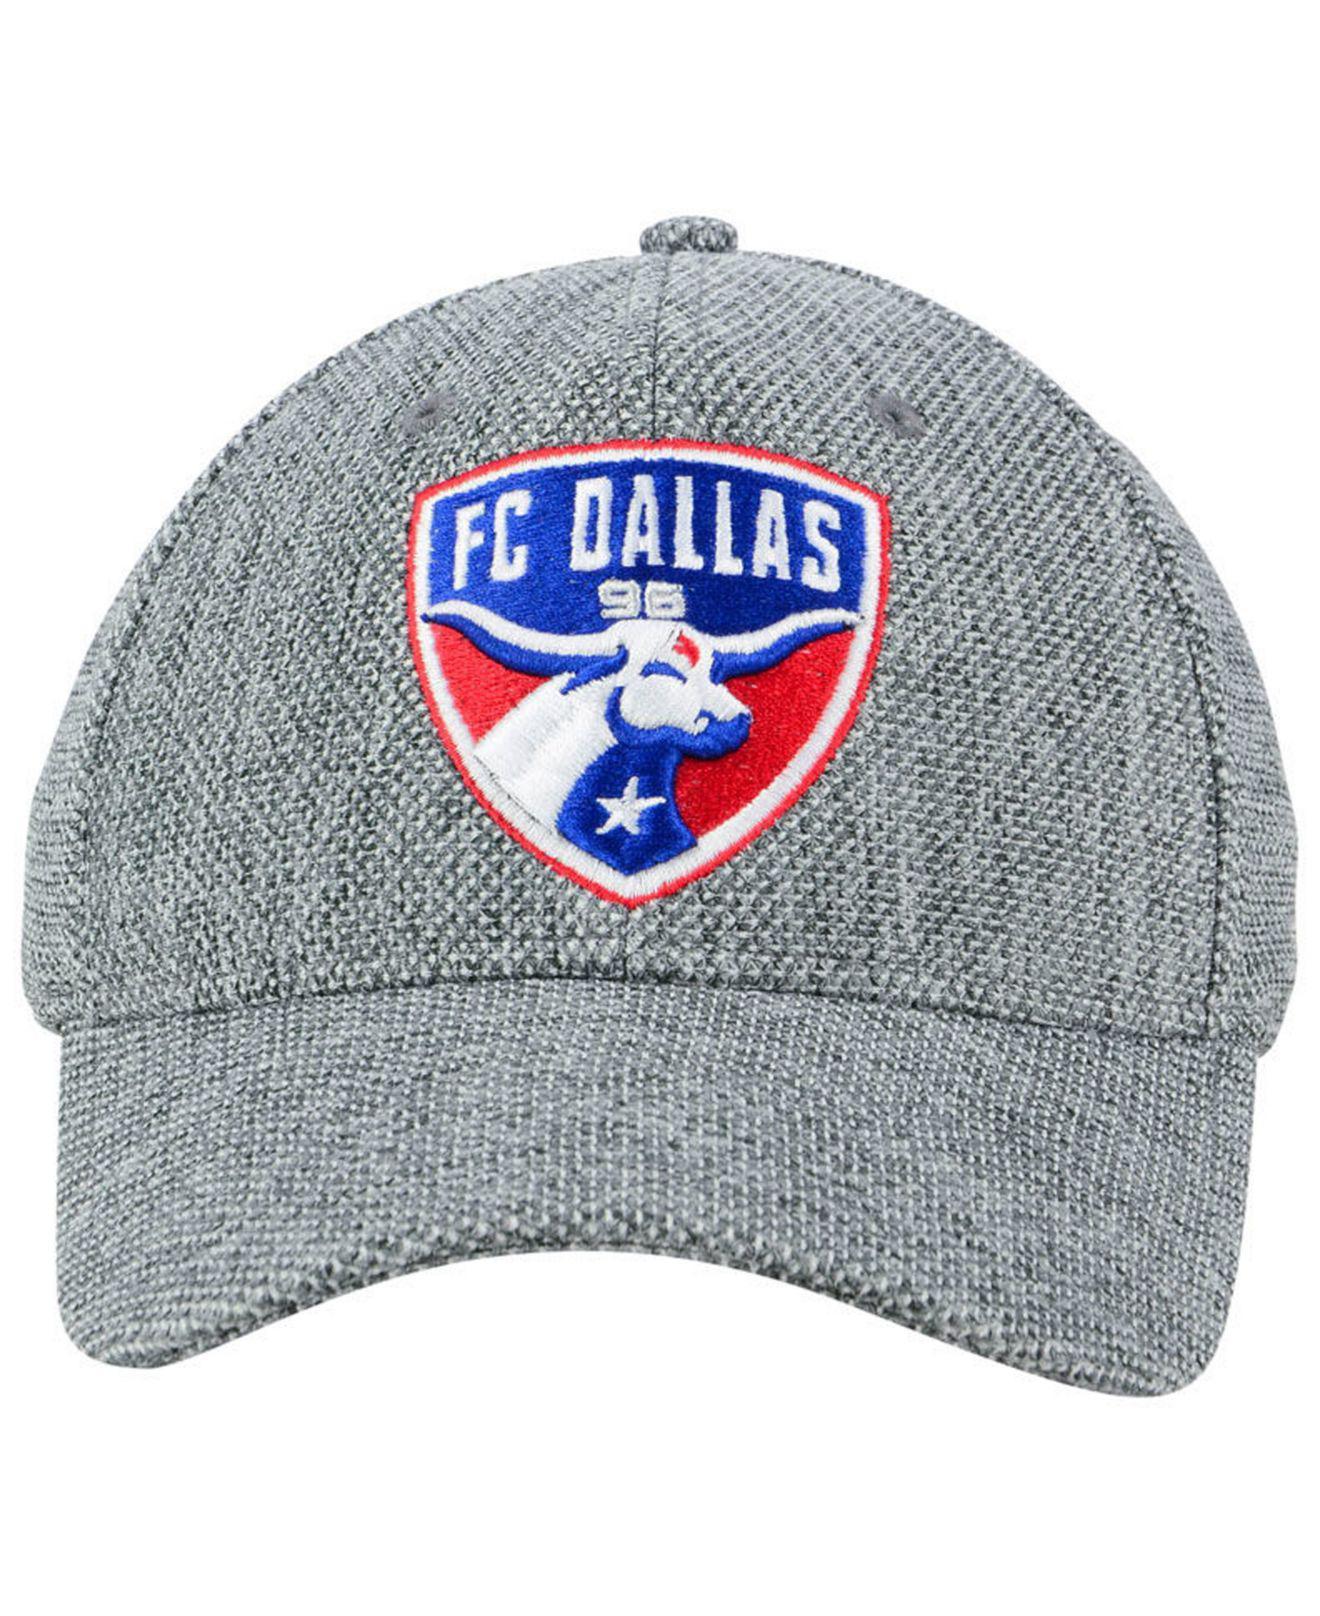 timeless design 17e7b fc4db adidas Fc Dallas Penalty Kick Flex Cap in Gray for Men - Lyst